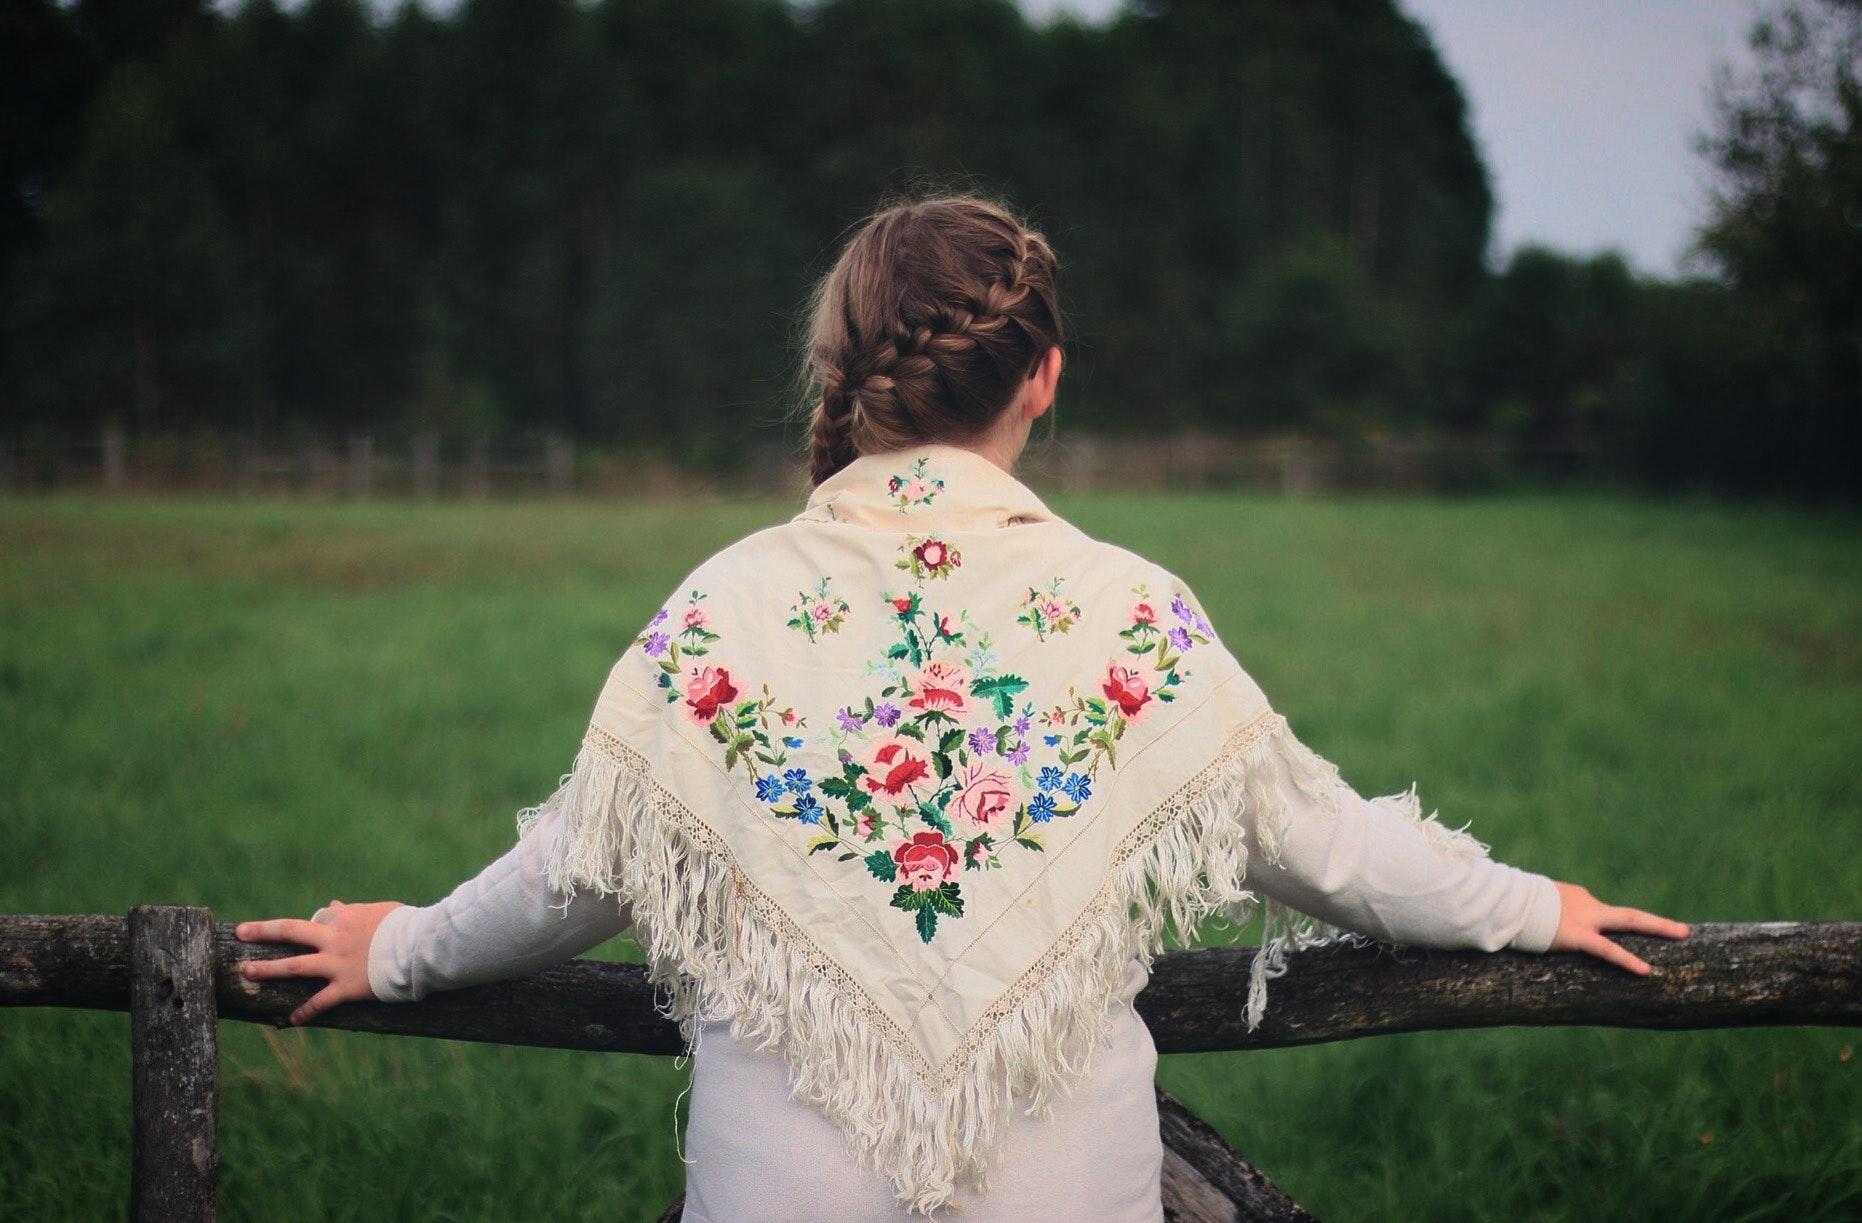 Collingwood to Honour Indigenous People